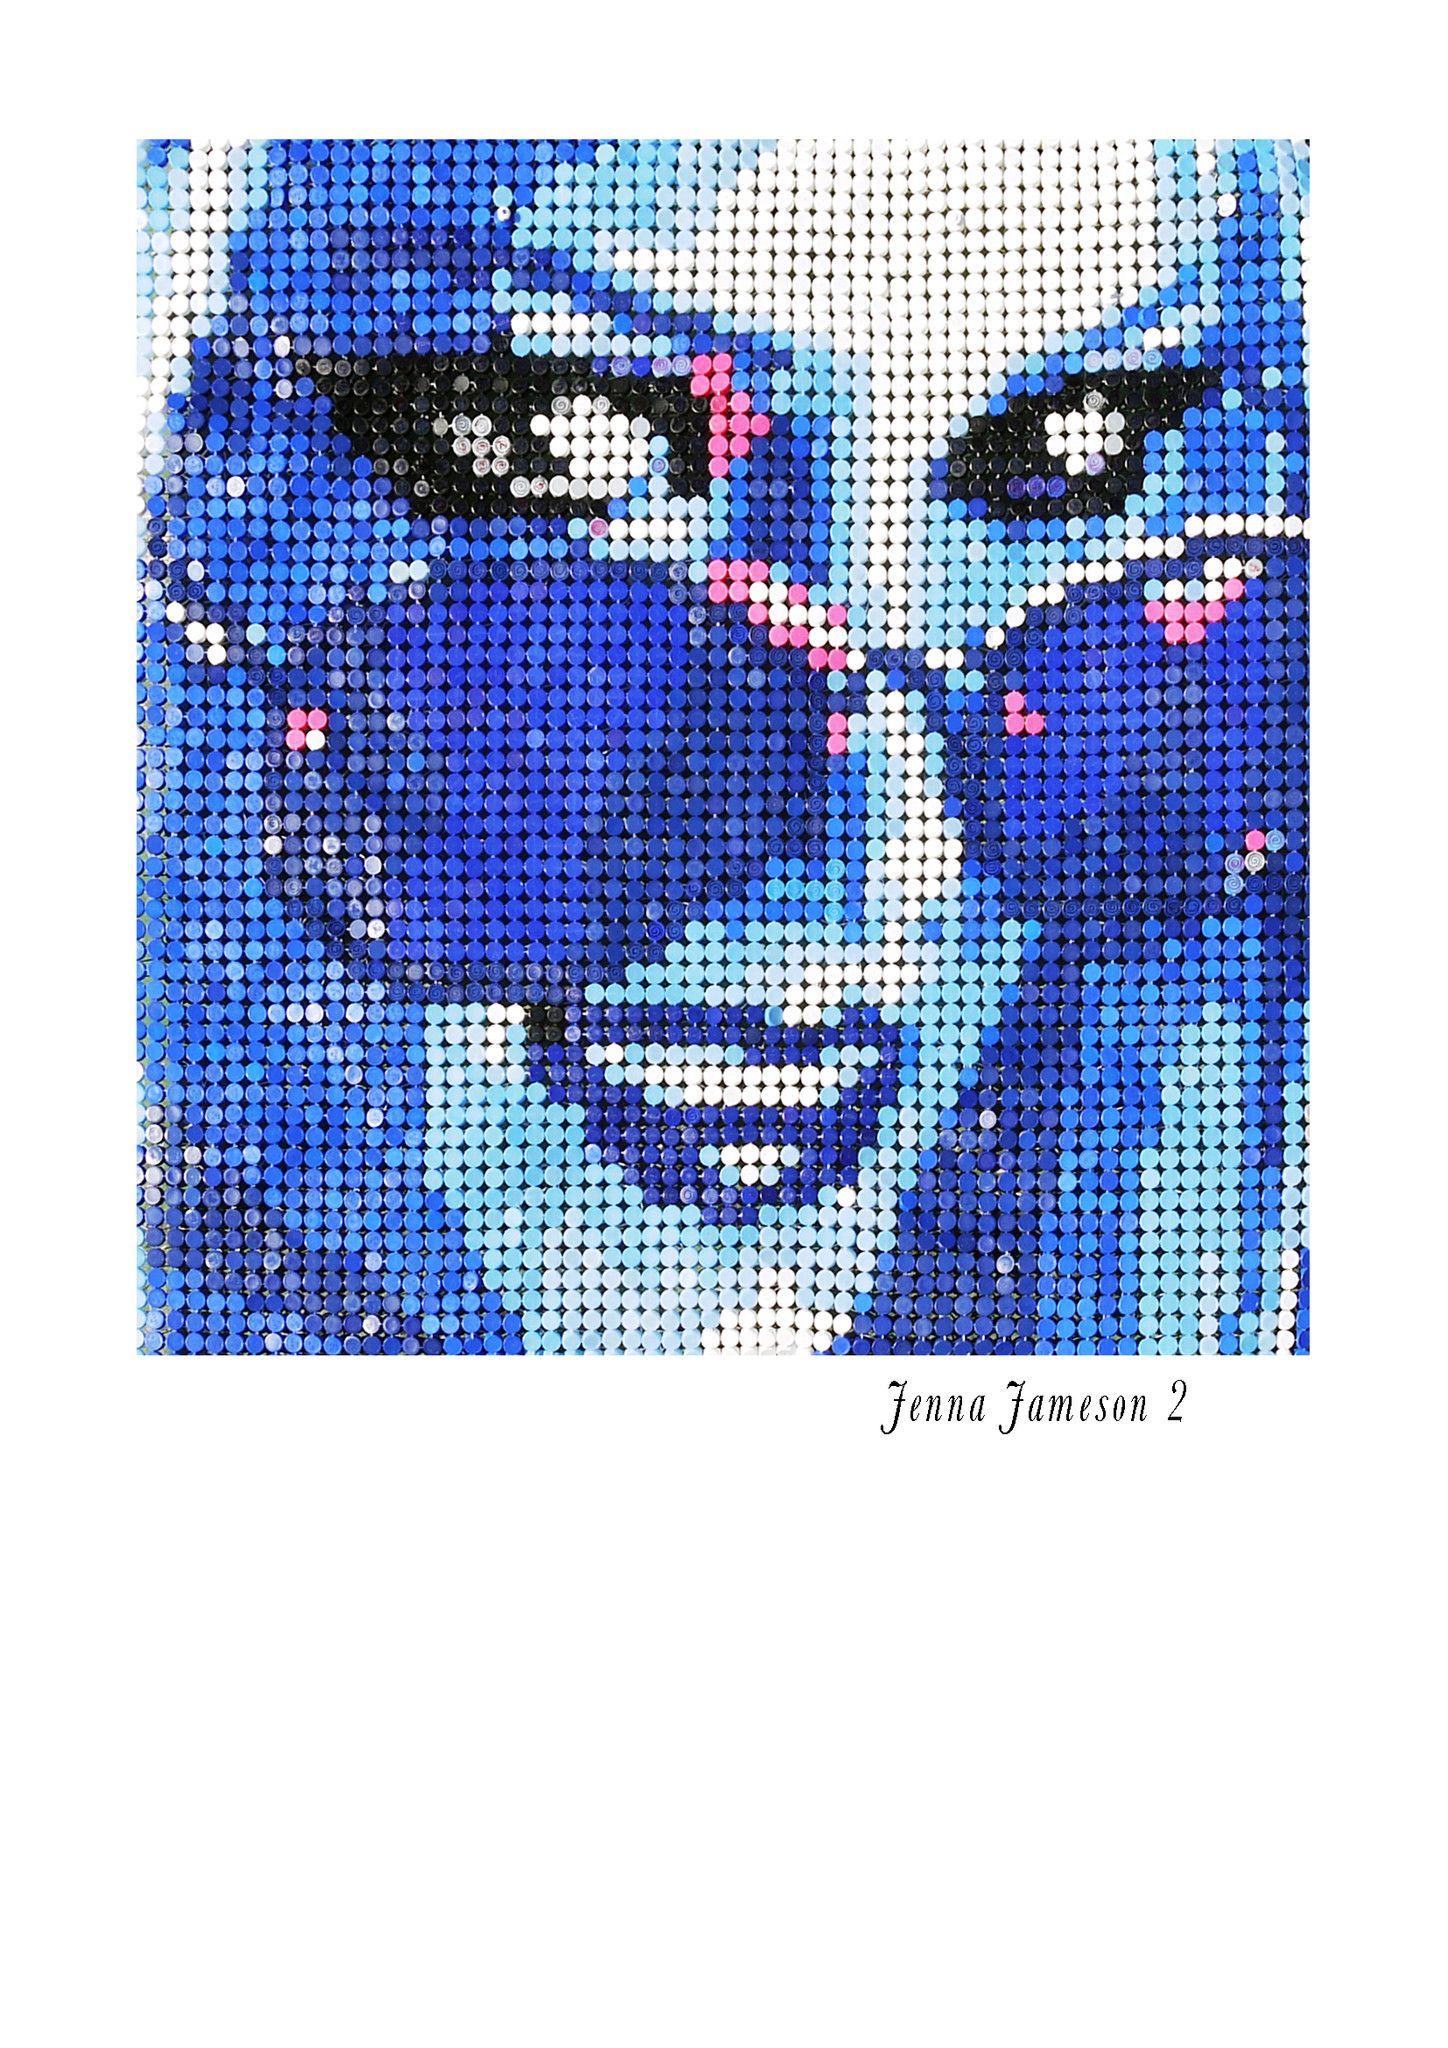 "MIXED MEDIA JORGE CASTRO GOMEZ "" JENNA JAMESON 2 ""  dimensioni L 160 x H 160 cm."